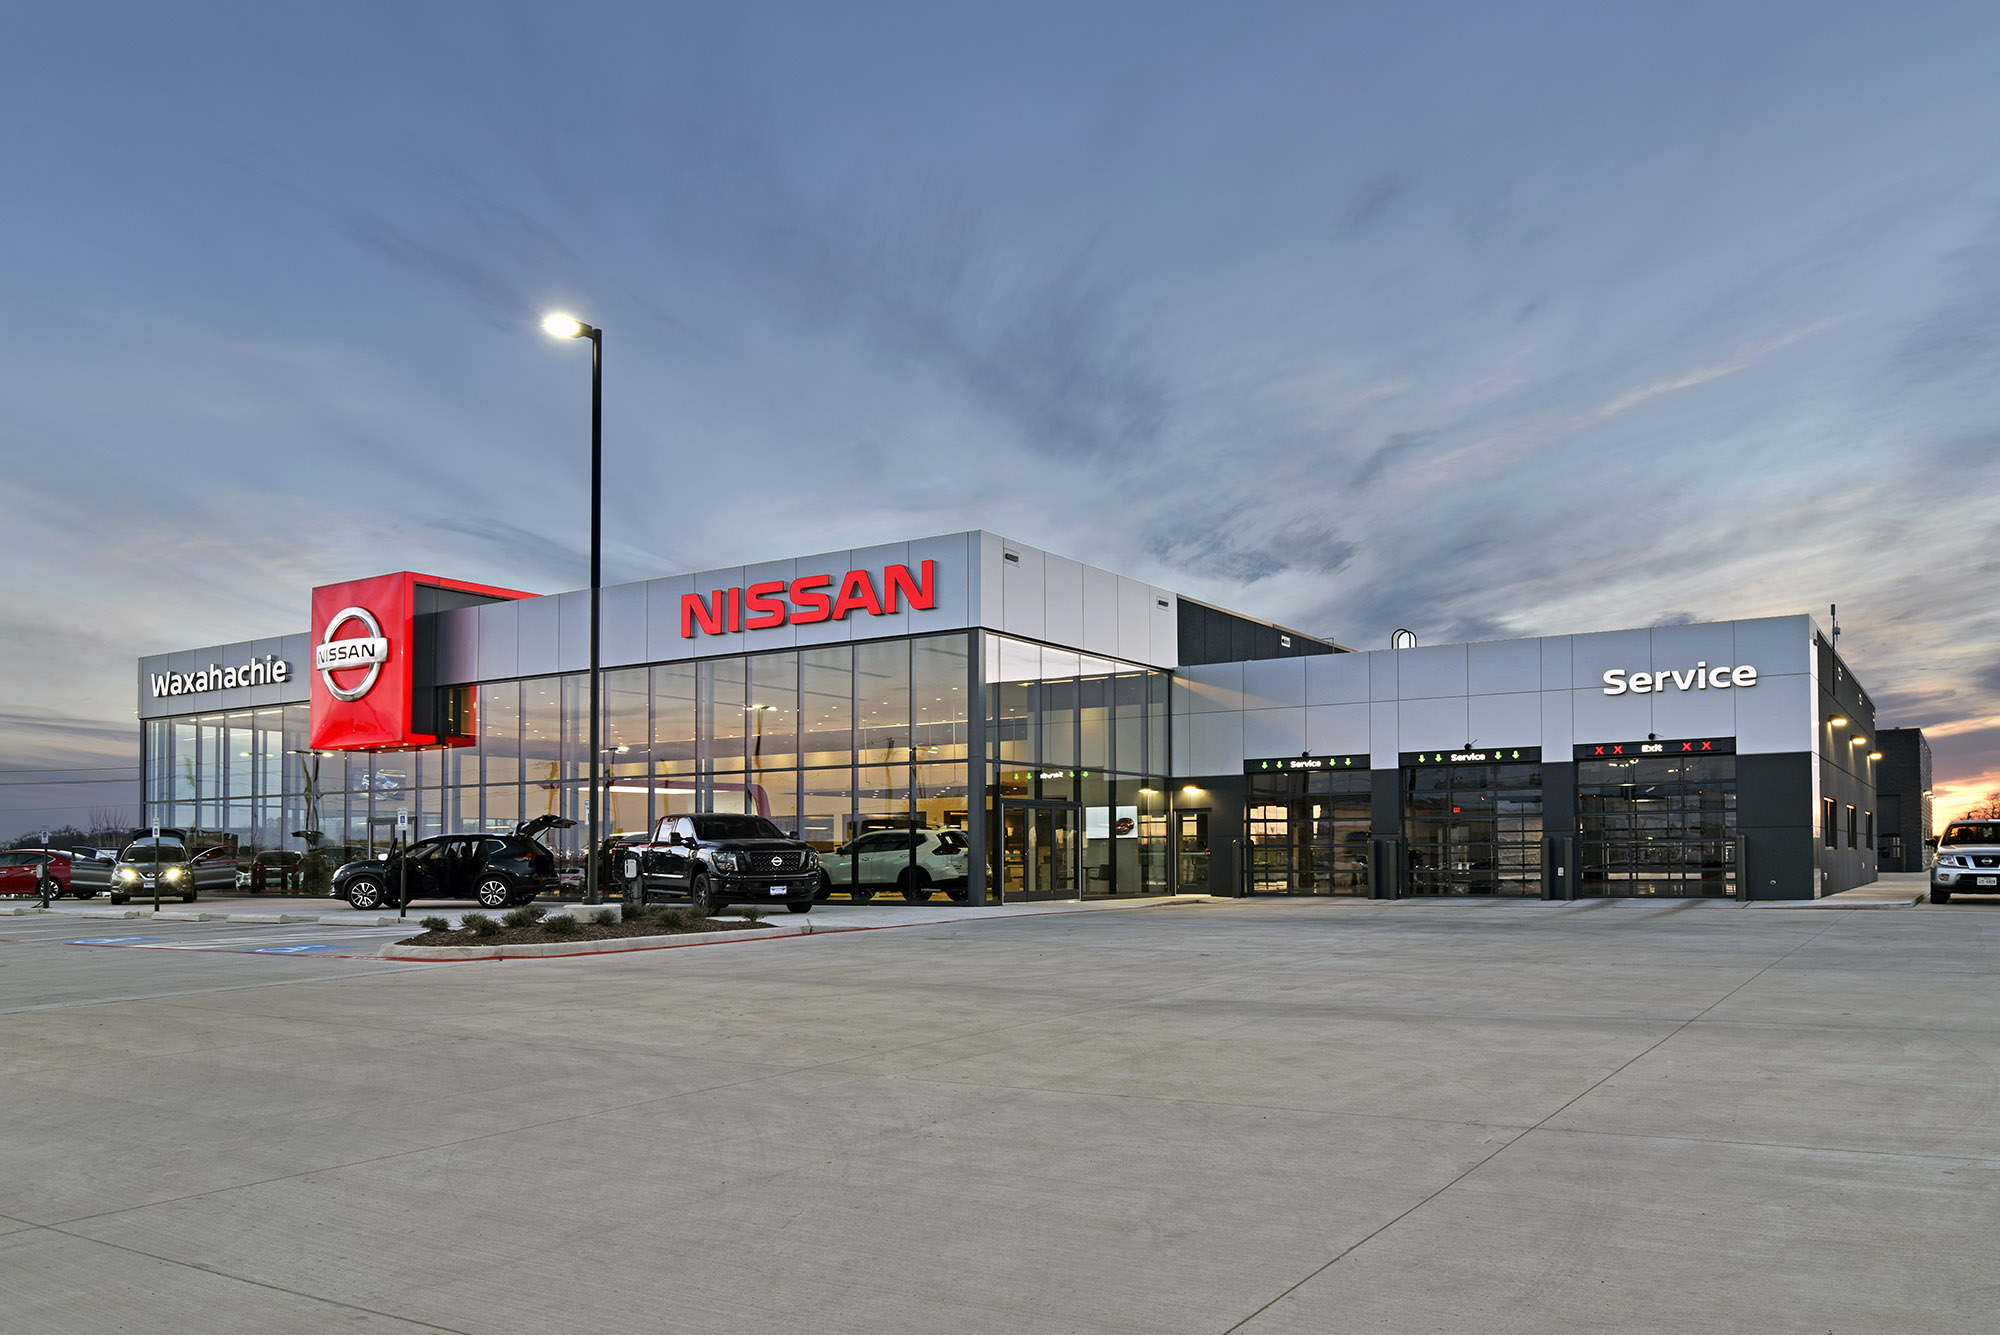 Nissan Dealership Okc >> Waxahachie Nissan Dealership Cedar Creek Civil